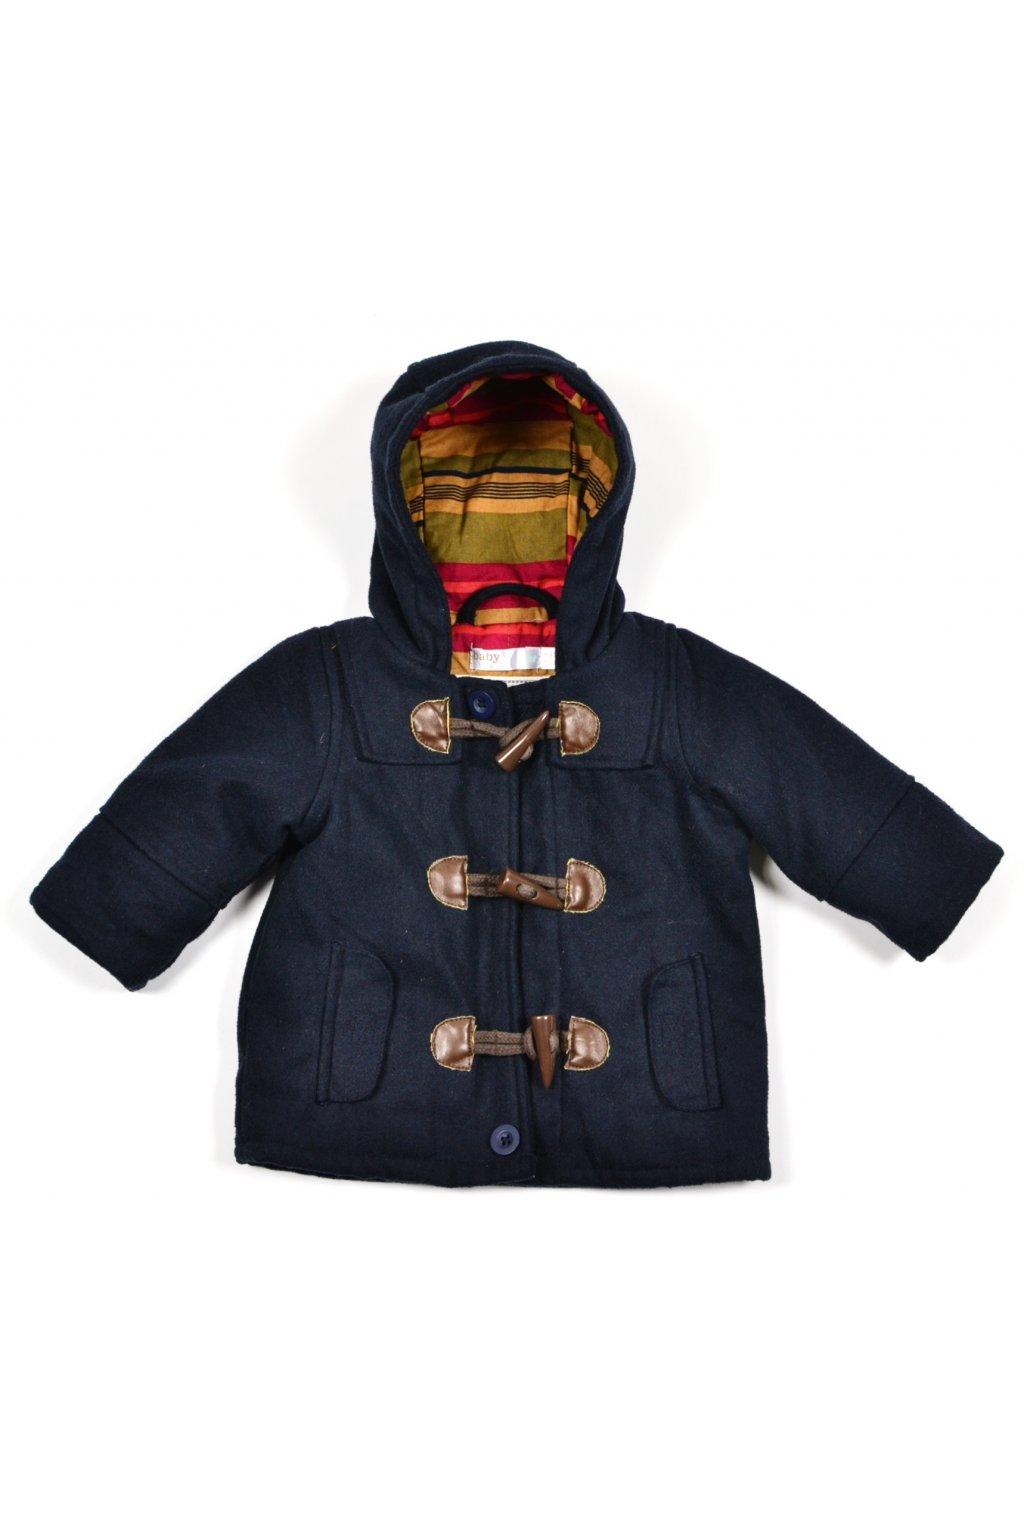 Bunda kabátek podzim/zima 3-6 měs/68 M&Co